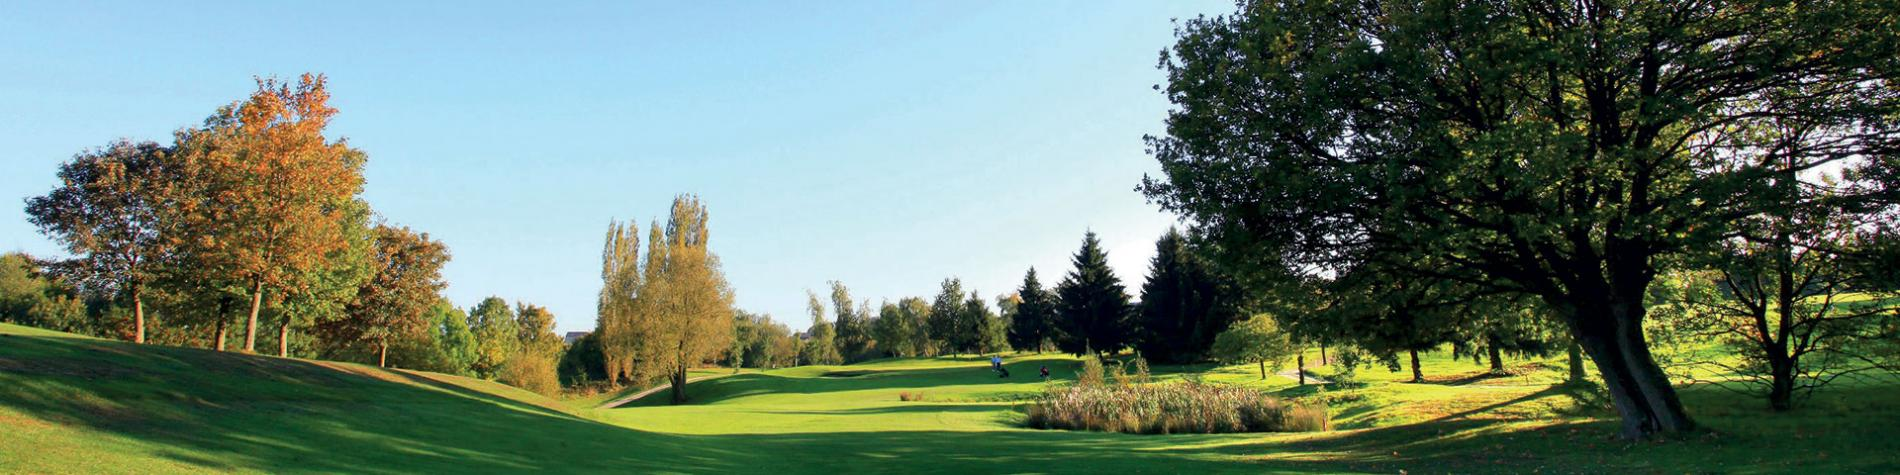 Golf - Henri Chapelle